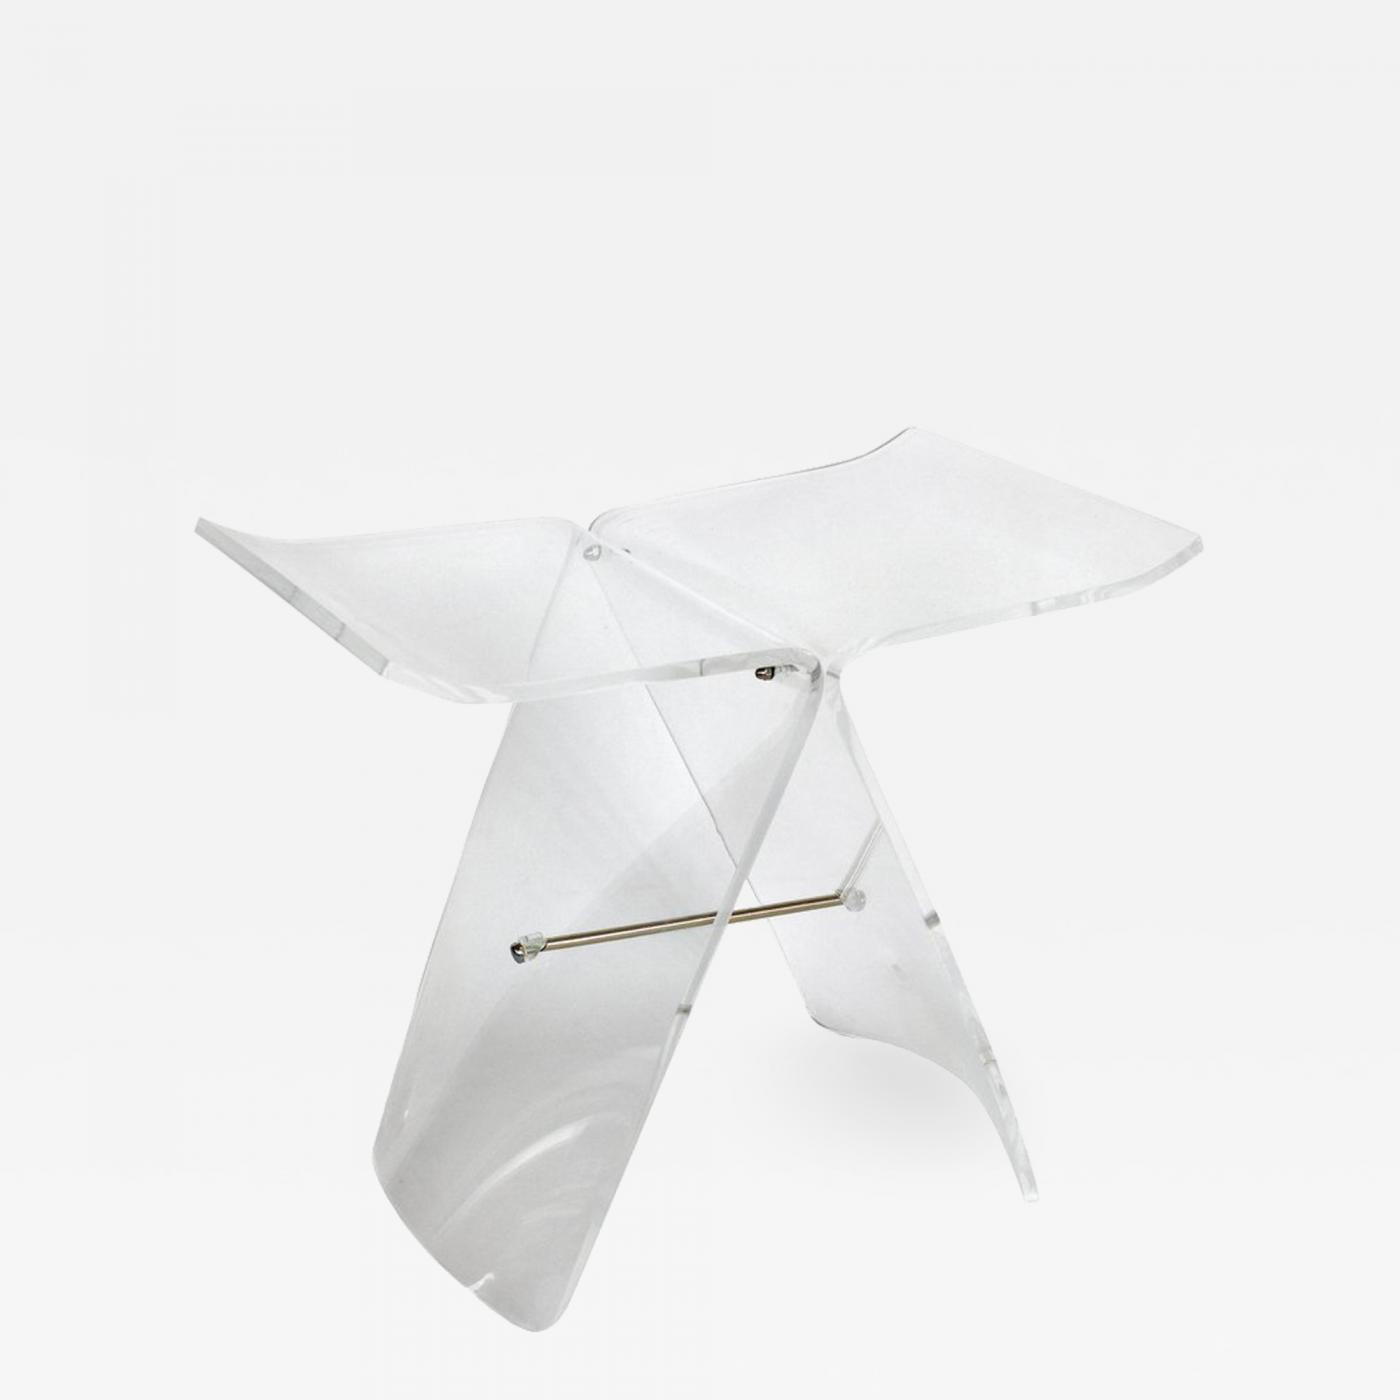 Sori Yanagi Lucite Butterfly Stool After The Original Bentwood Stool By Sori Yanagi